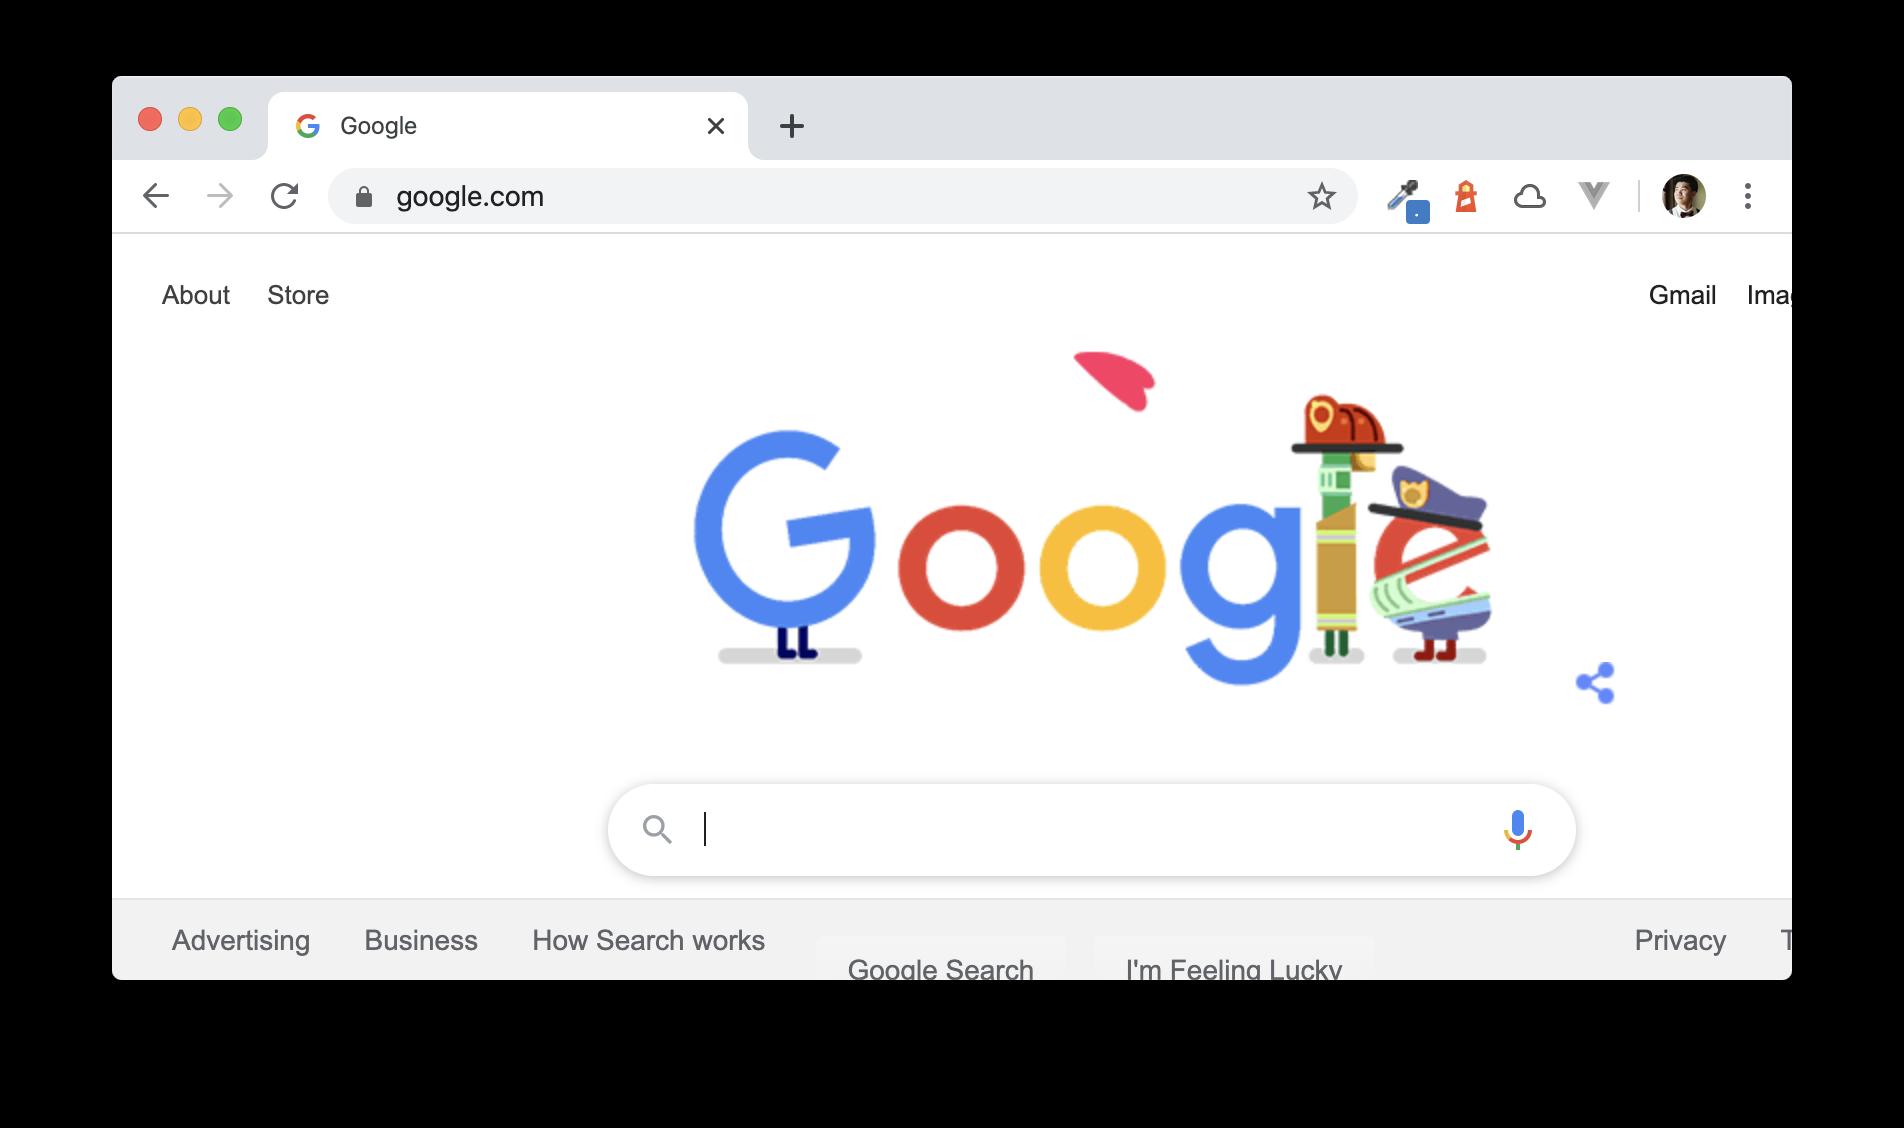 Google main page screenshot on April 8th 2020